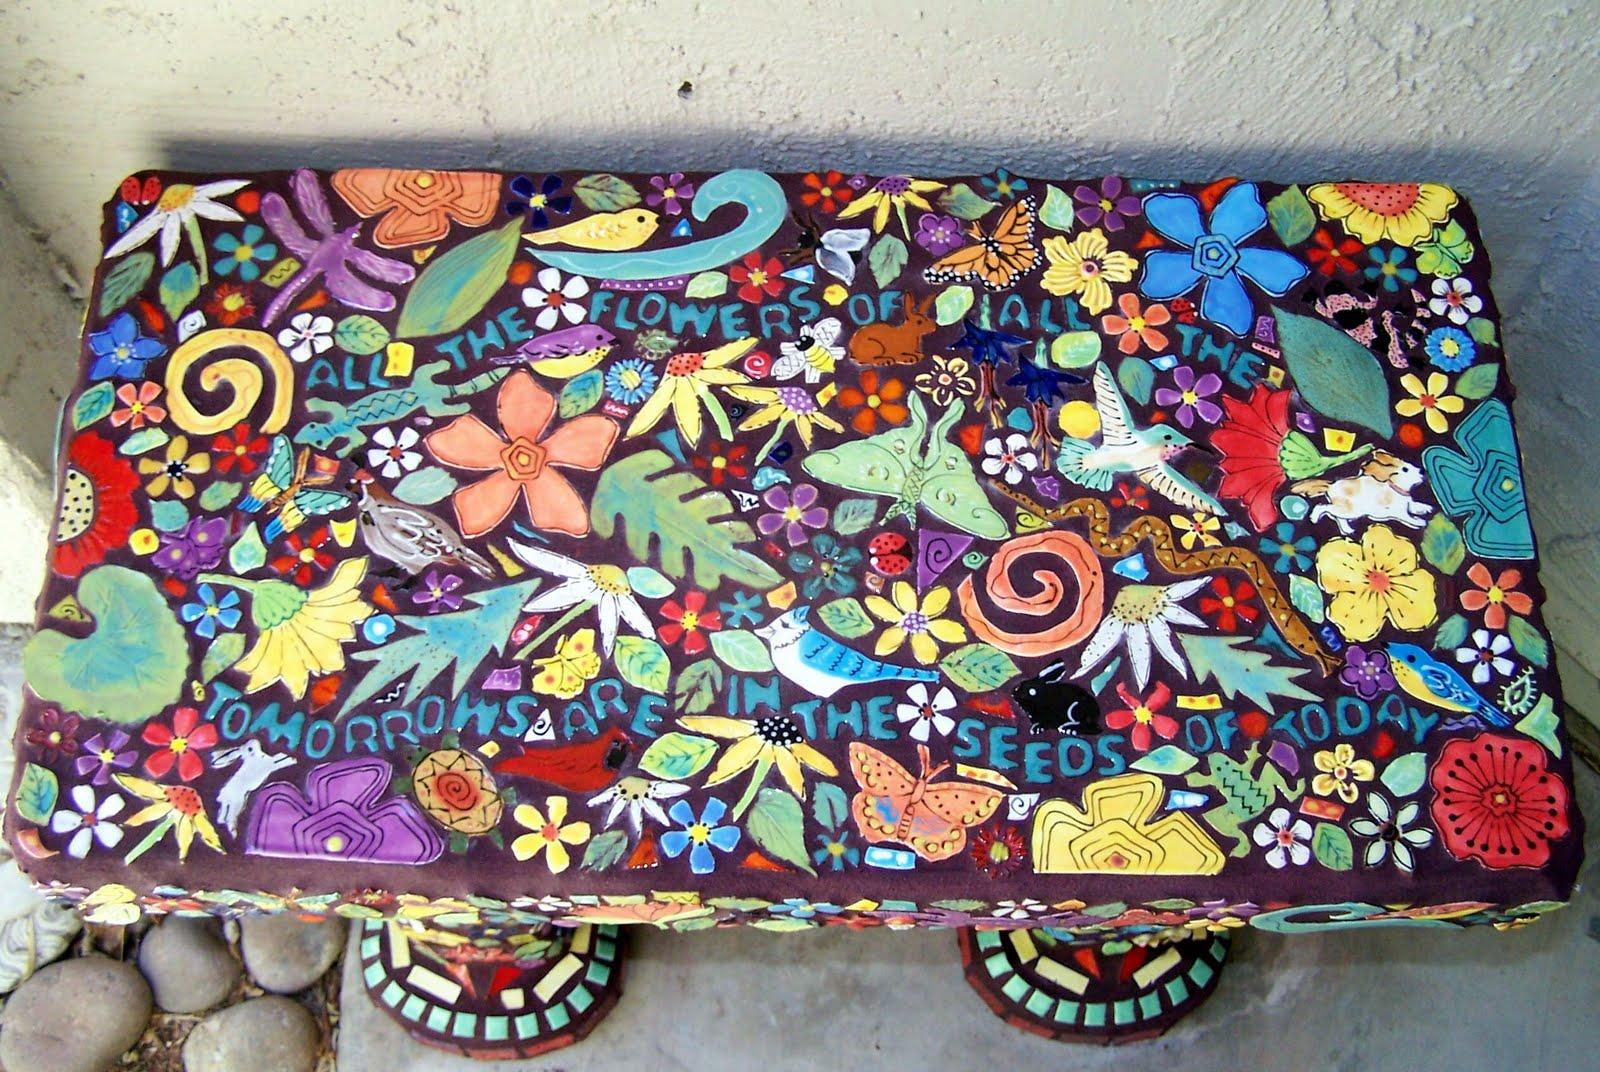 Handmade Tile Studio Bench Covered With Handmade Tiles